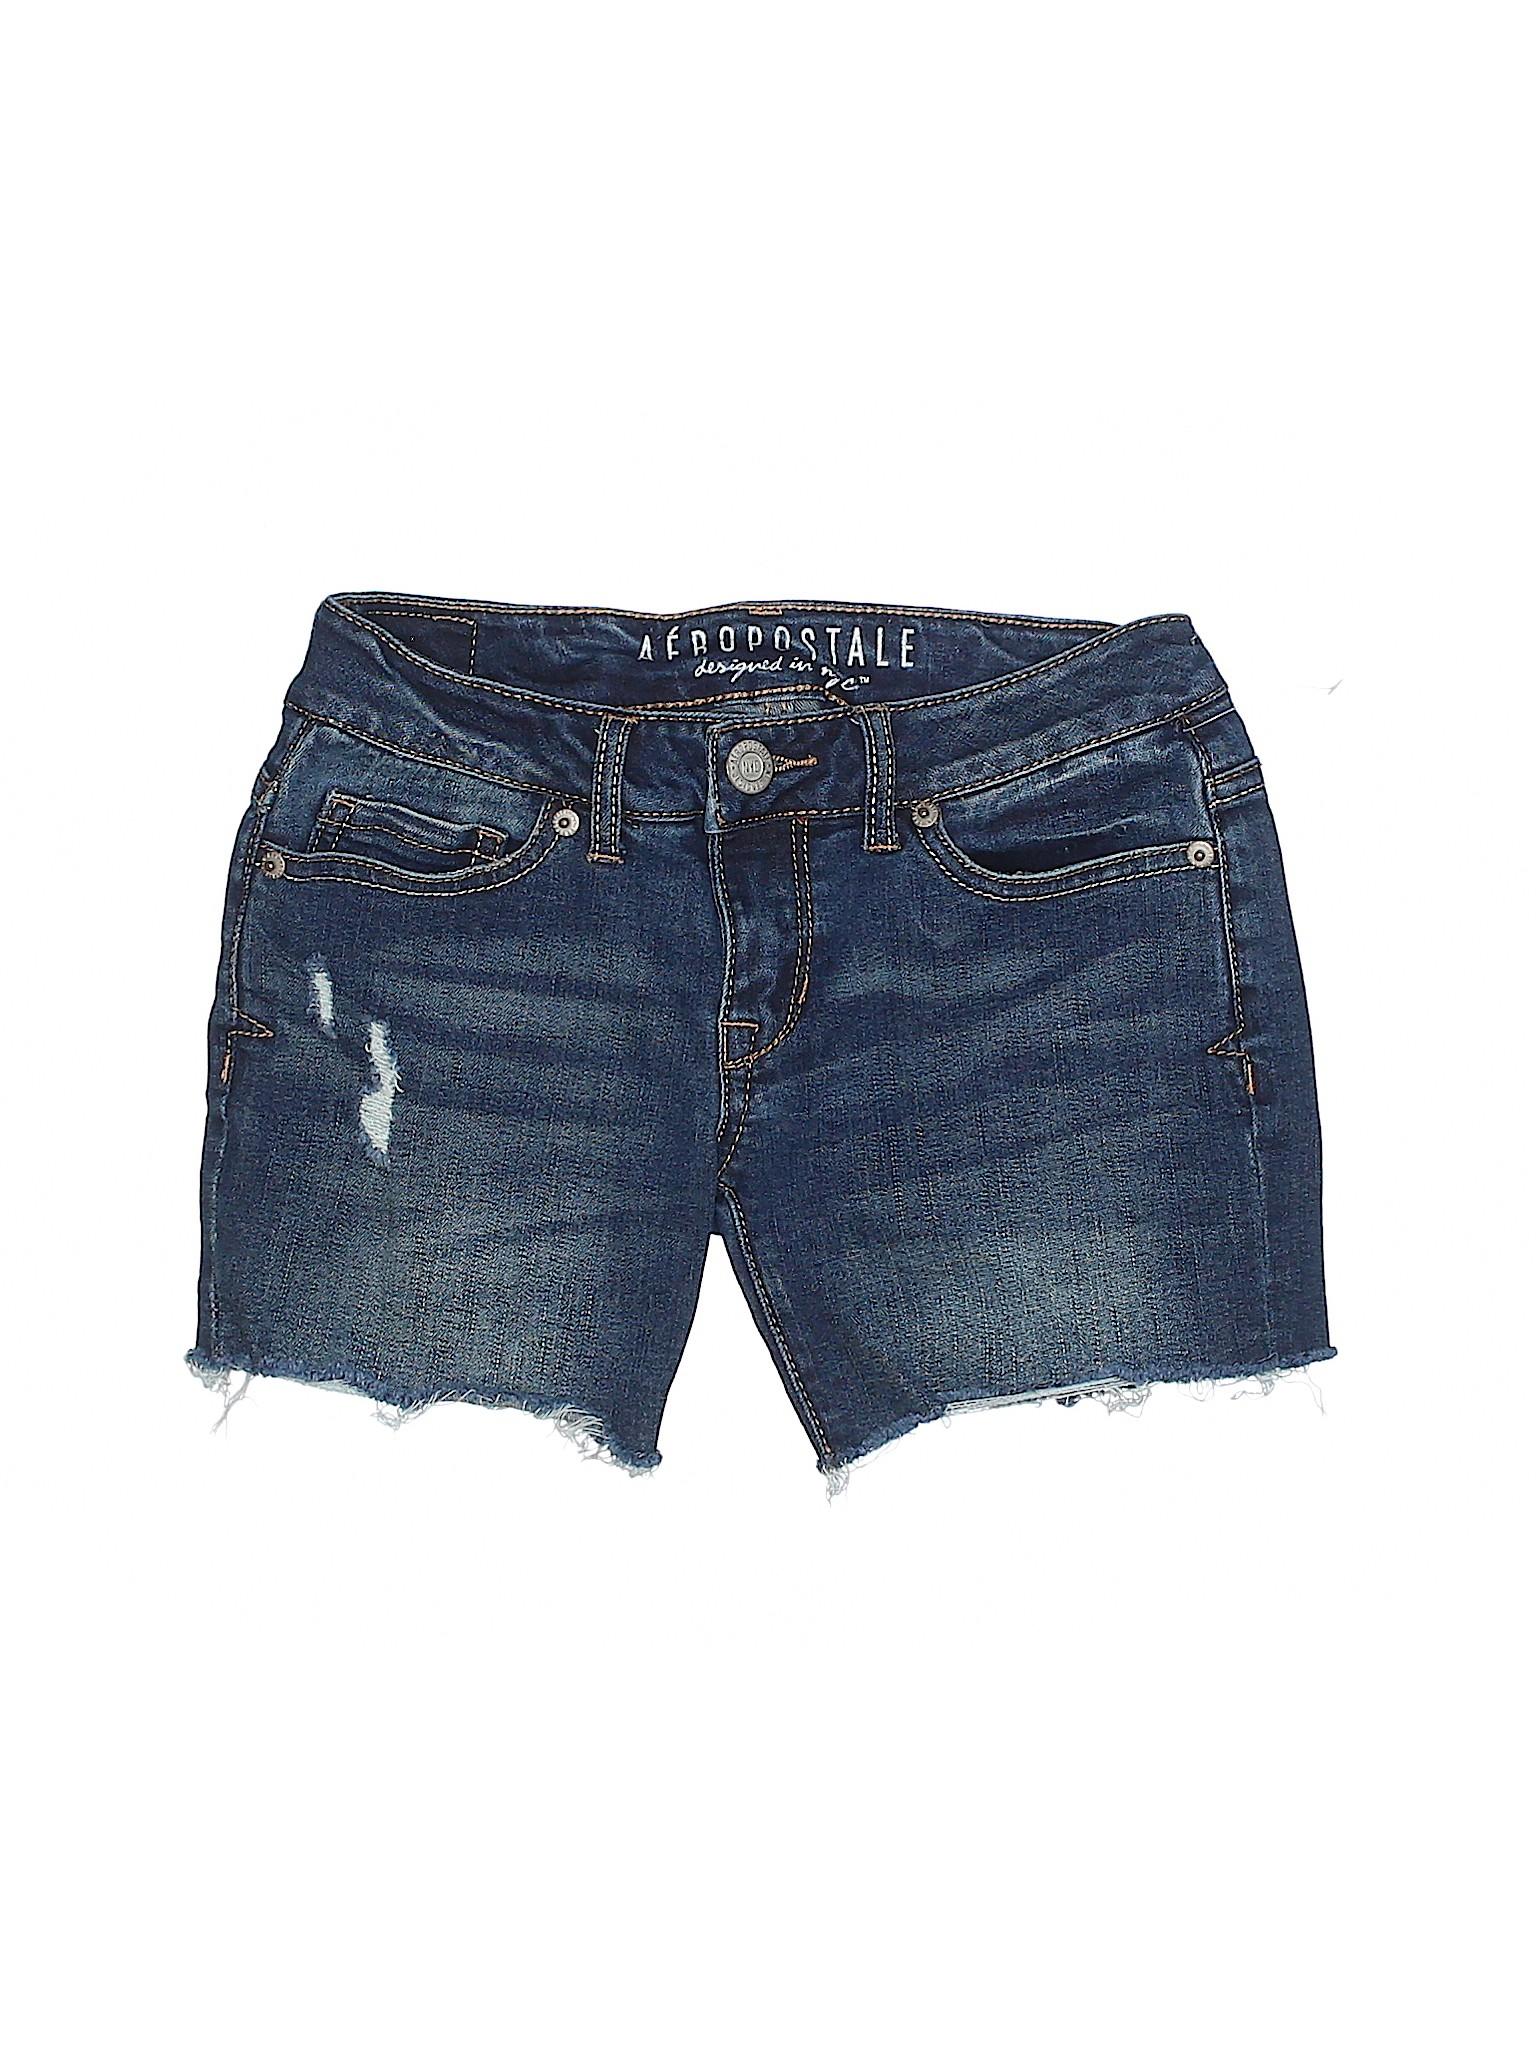 Denim Denim Aeropostale Shorts Denim Boutique Boutique Aeropostale Shorts Aeropostale Shorts Shorts Boutique Boutique Aeropostale Denim xU1qS